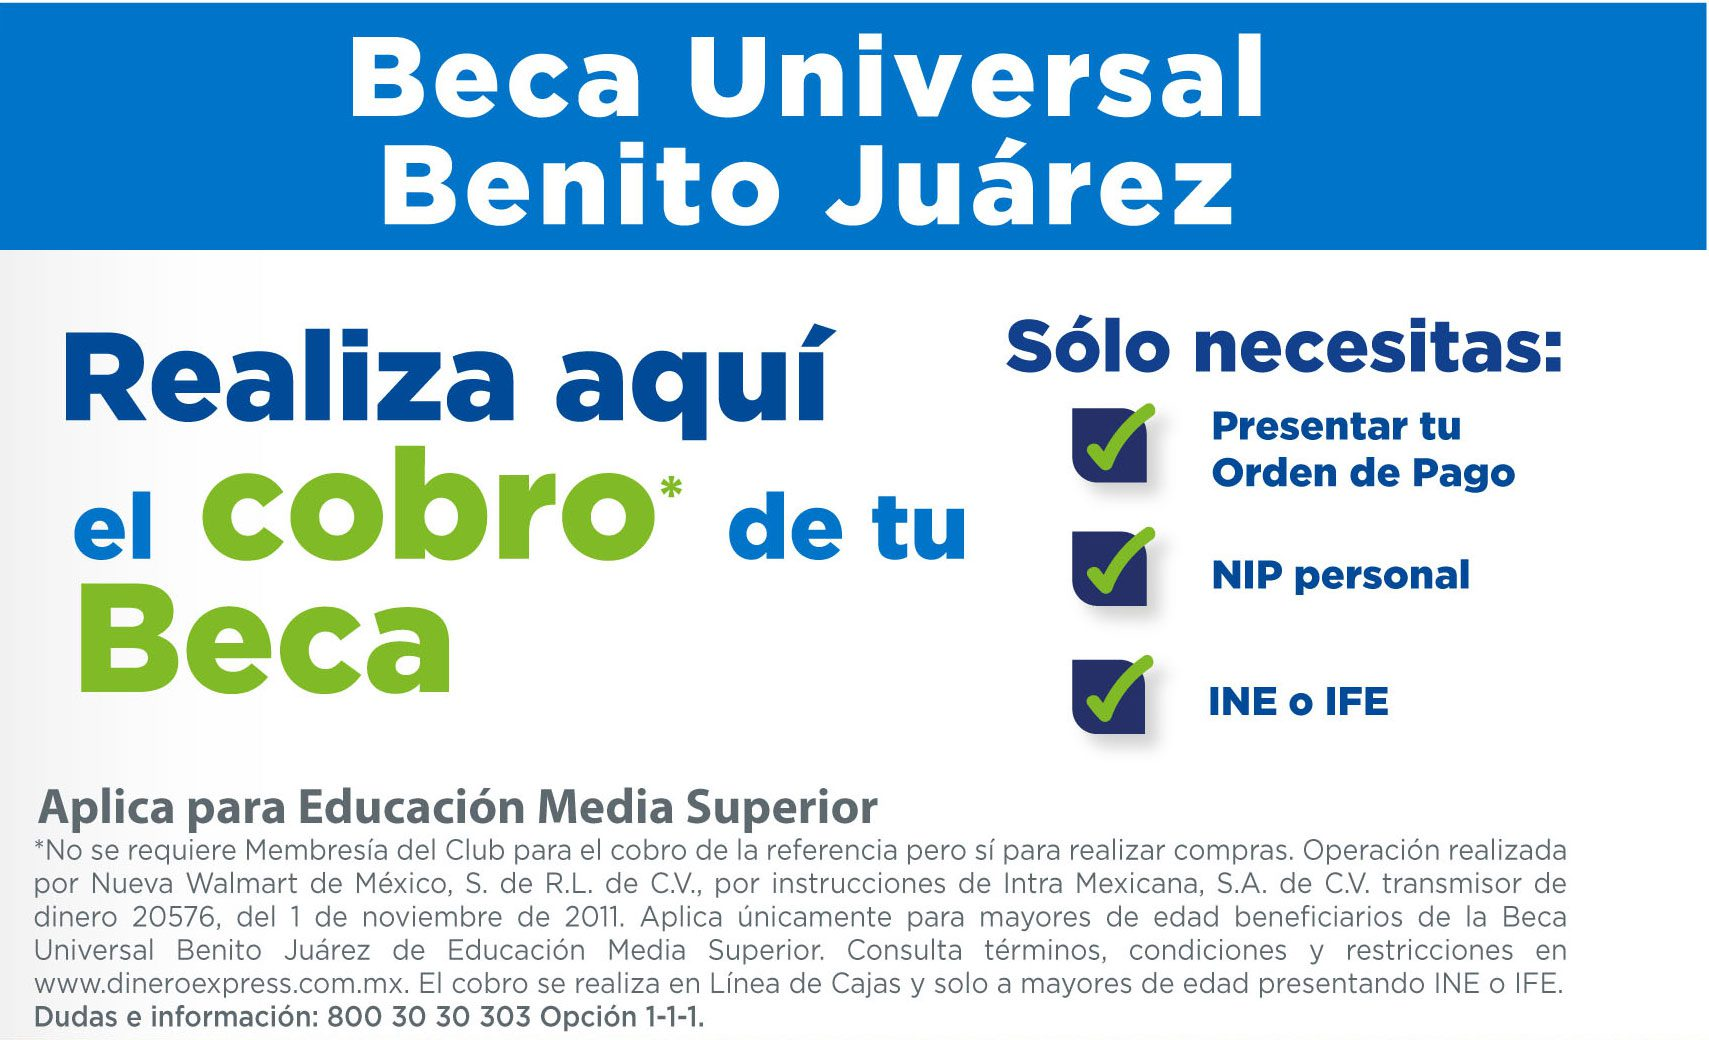 Beca universal Benito Juarez